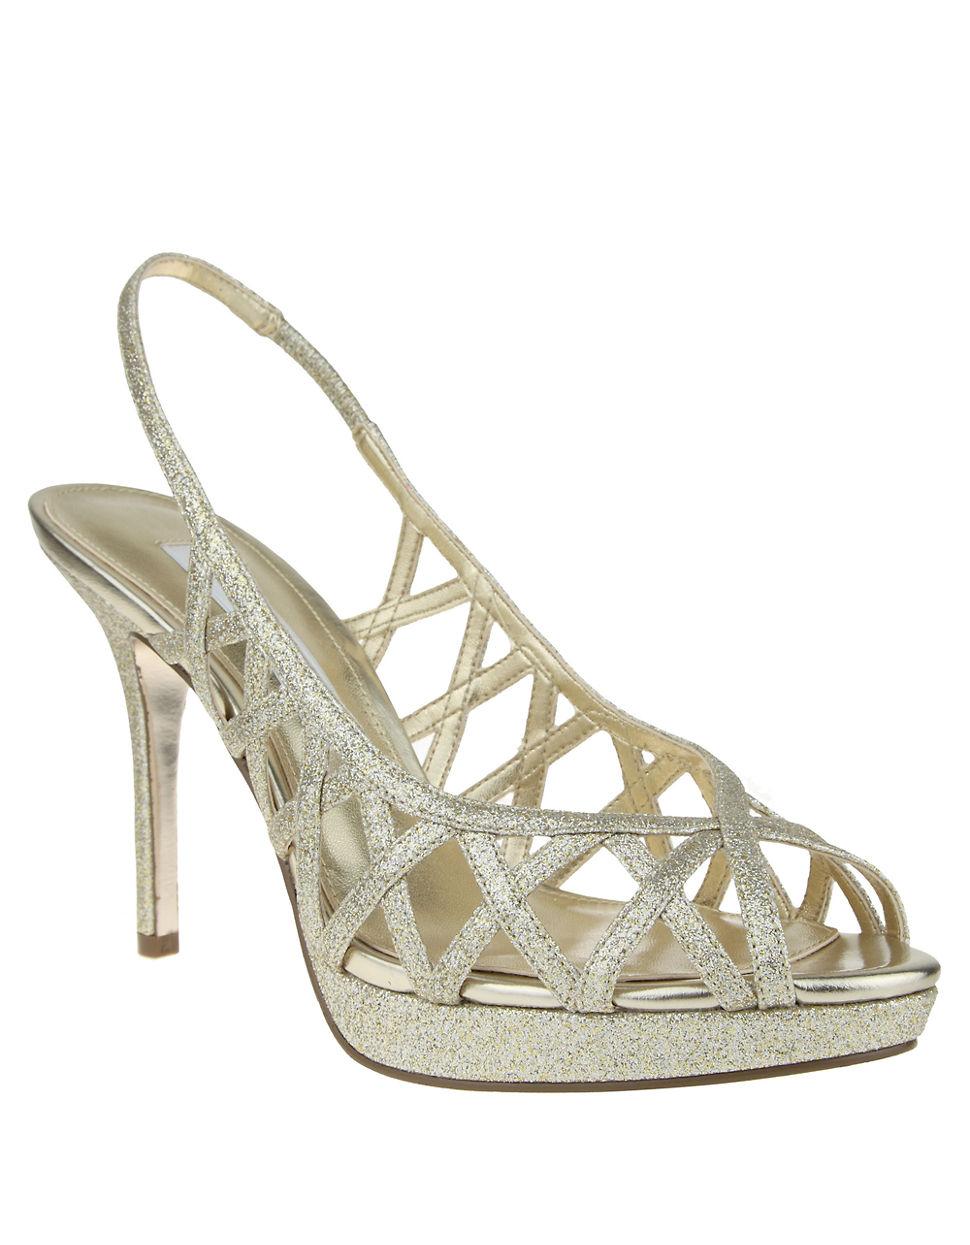 4238cd032bf Nina Fantina Glitter Peep-toe Slingback Sandals in Metallic - Lyst